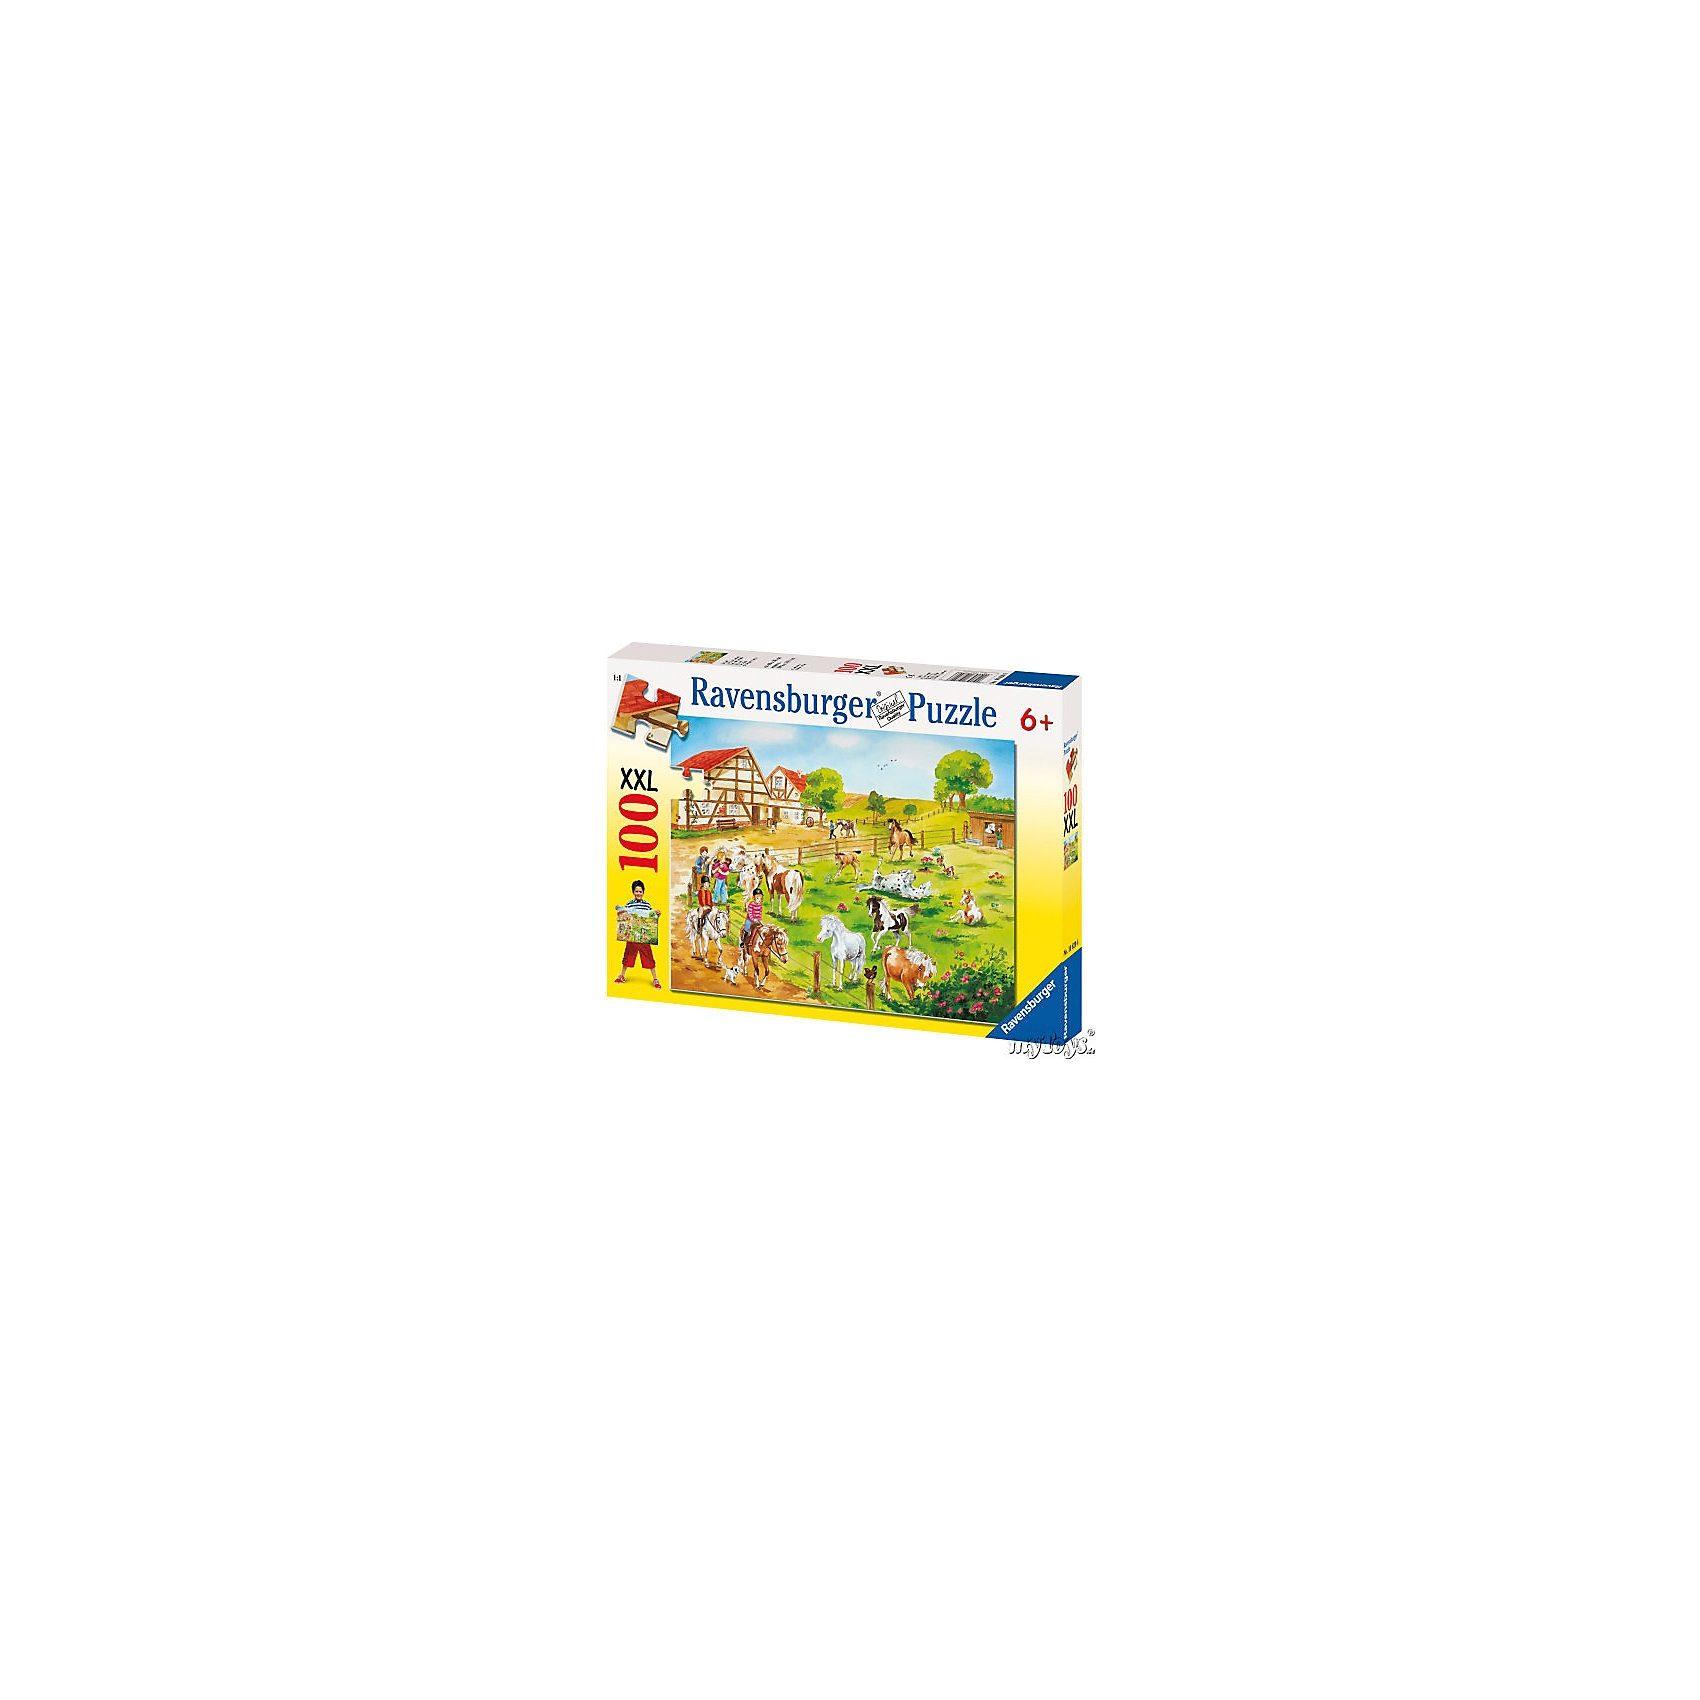 Ravensburger Puzzle XXL 100 Teile Ponyhof